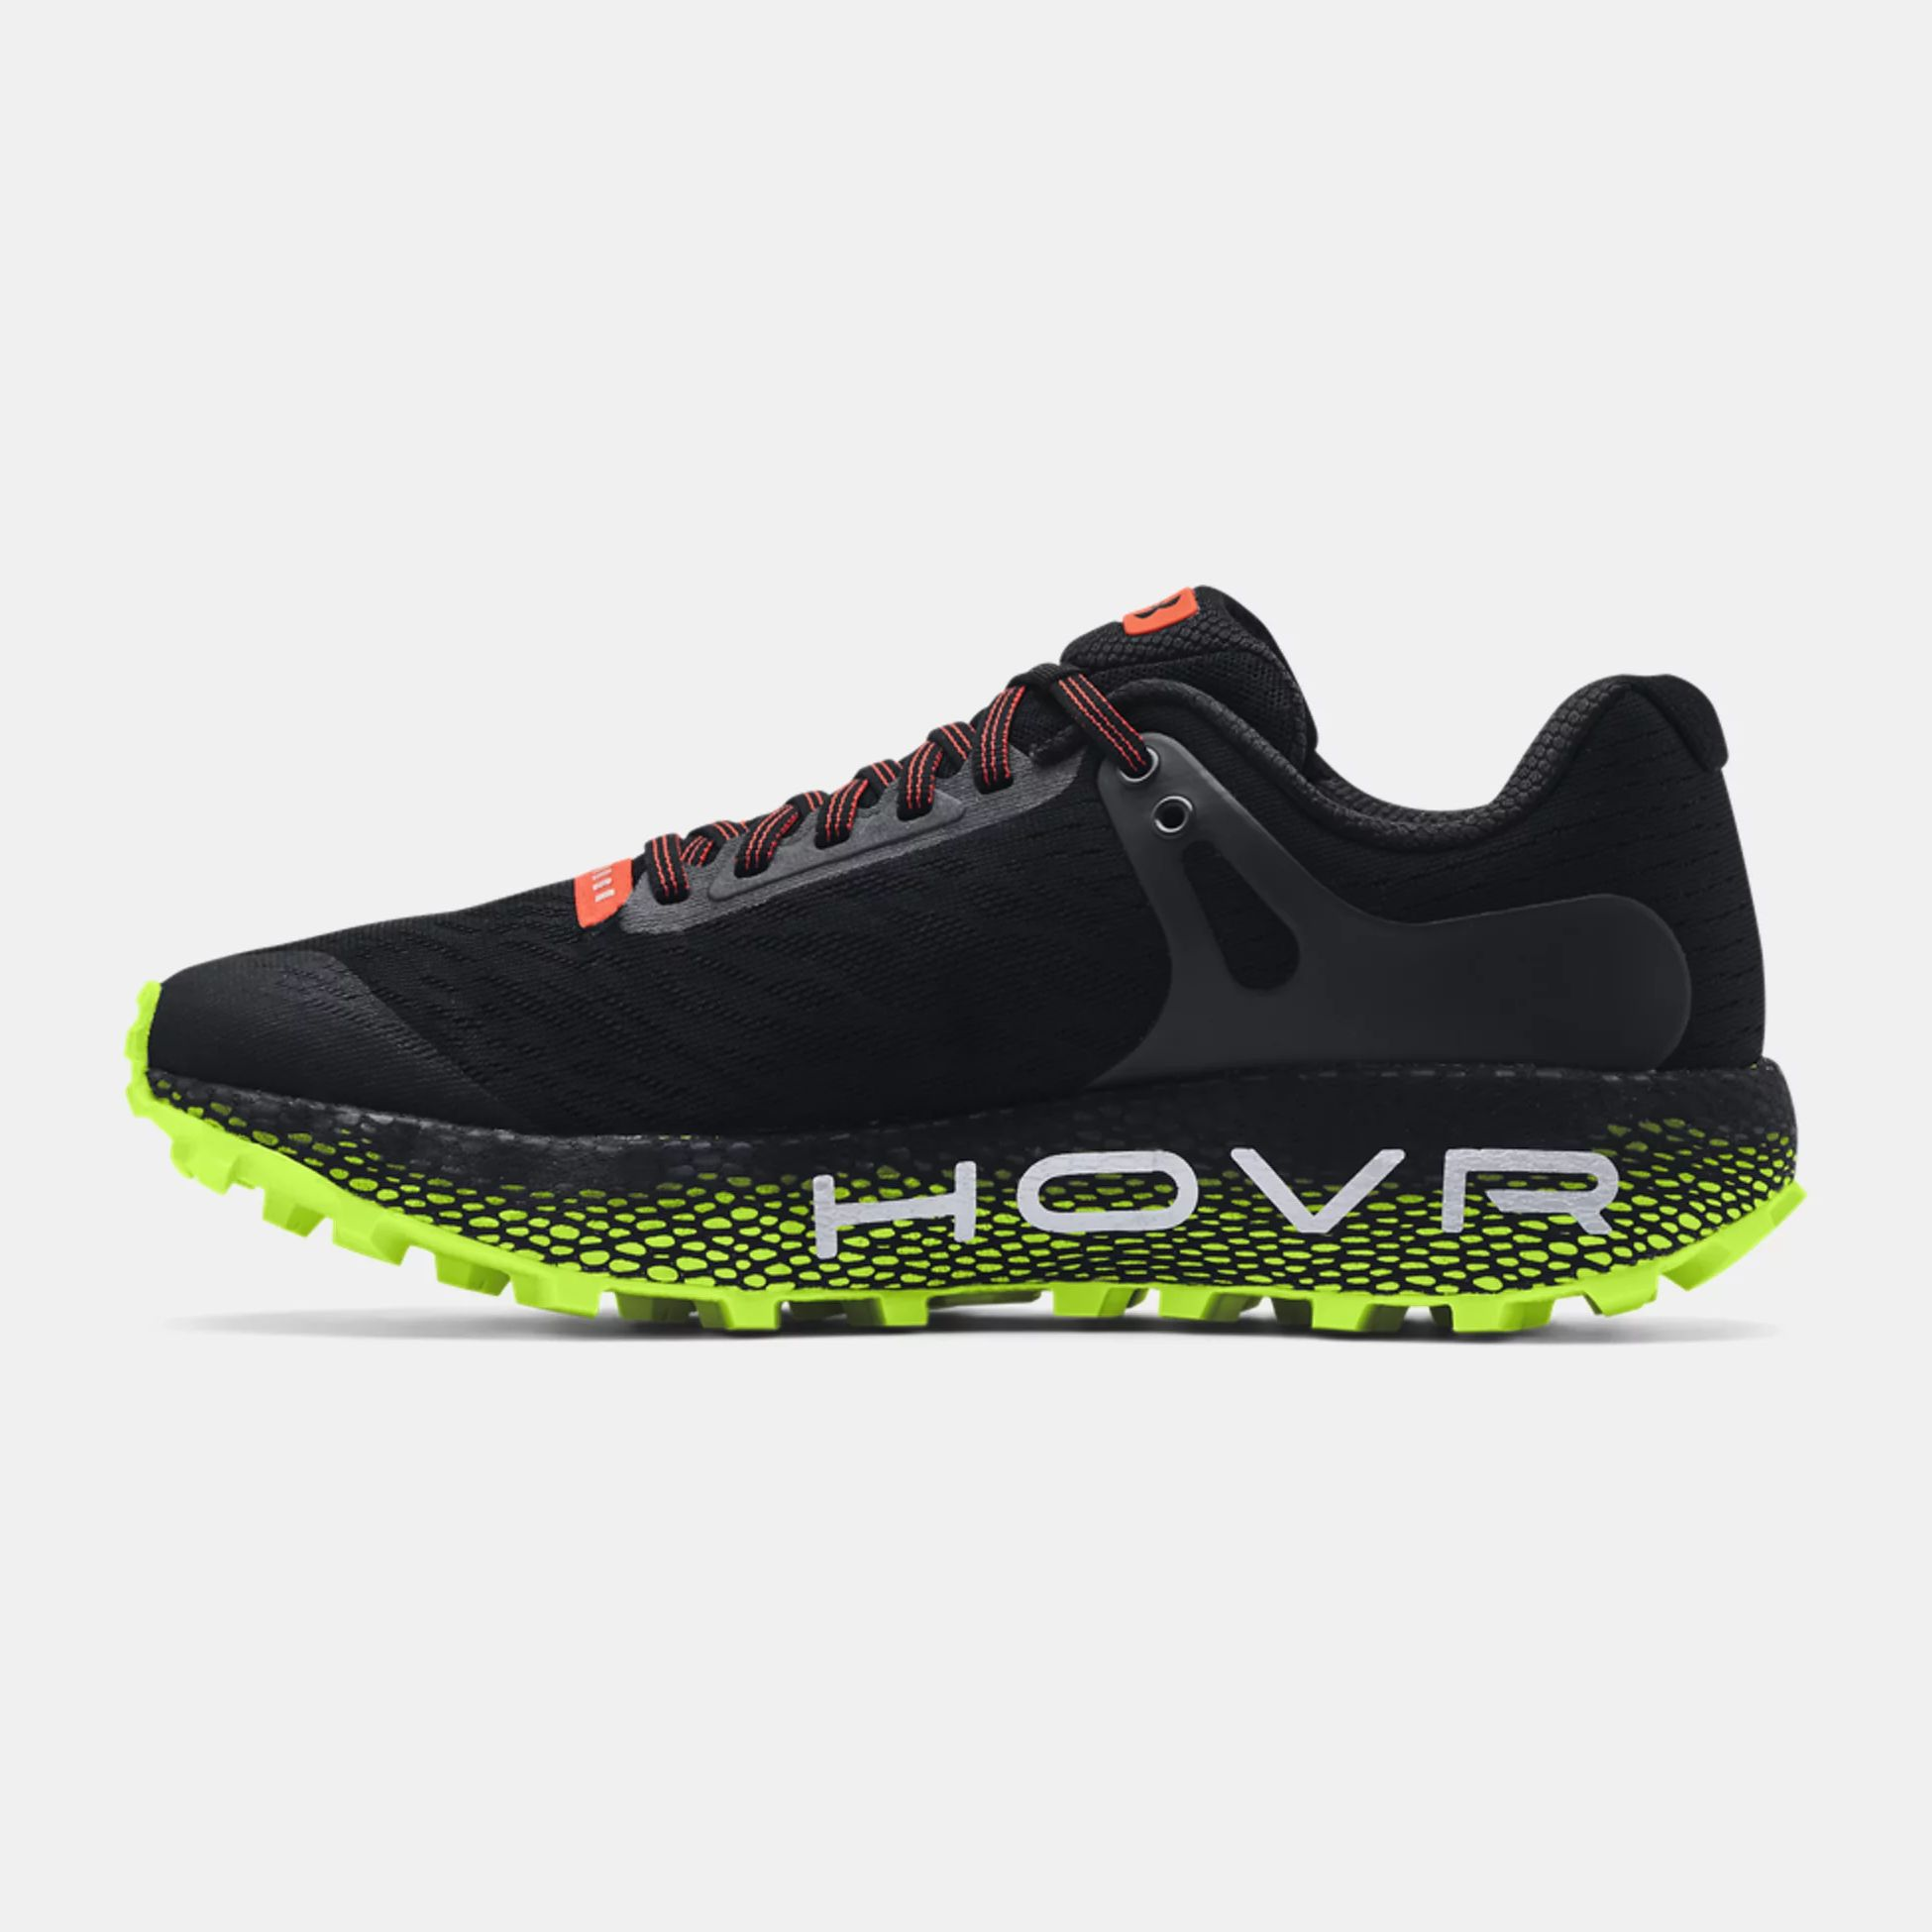 Încălțăminte -  under armour UA HOVR Machina Off Road Running Shoes